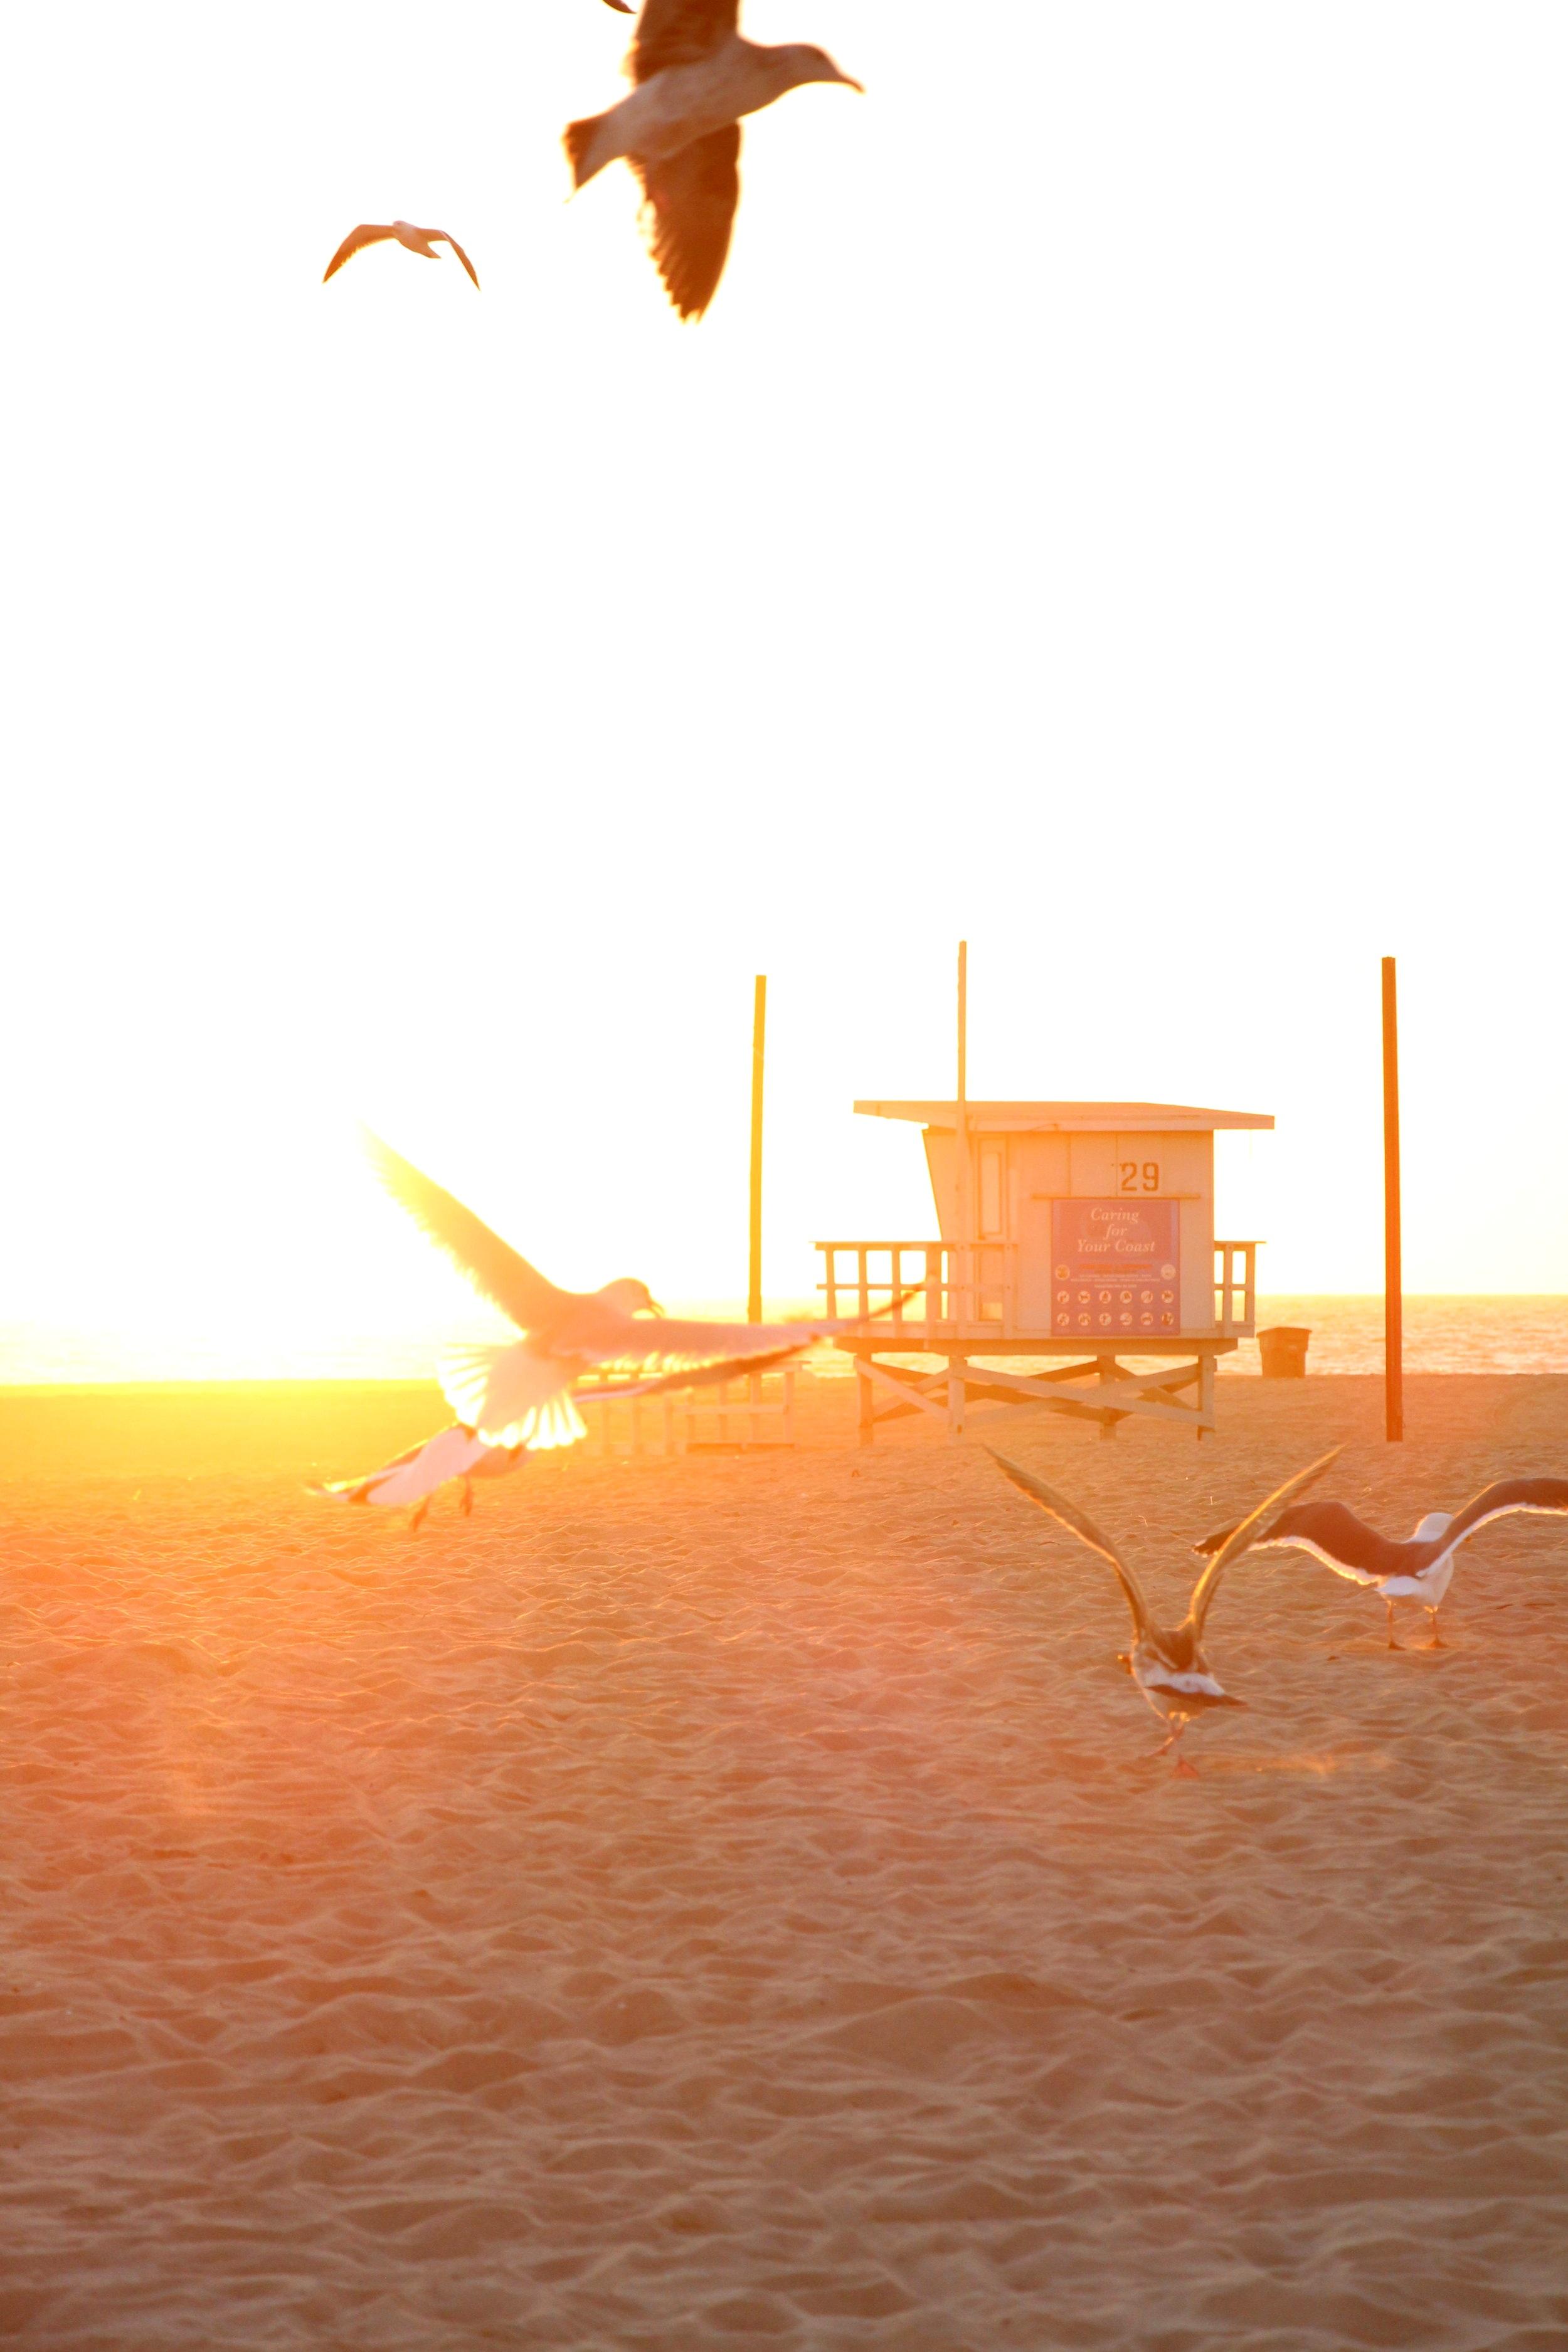 CONTACT - 94 Highland AvenueManhattan BeachCalifornia 90266 USAMarie-Agnèsfr + 33 6 99 20 08 46us + 1 310 974 2443marie@bungalowproduction.comGaryfr + 33 7 82 78 16 02us + 1 310 469 4888gary@bungalowproduction.com